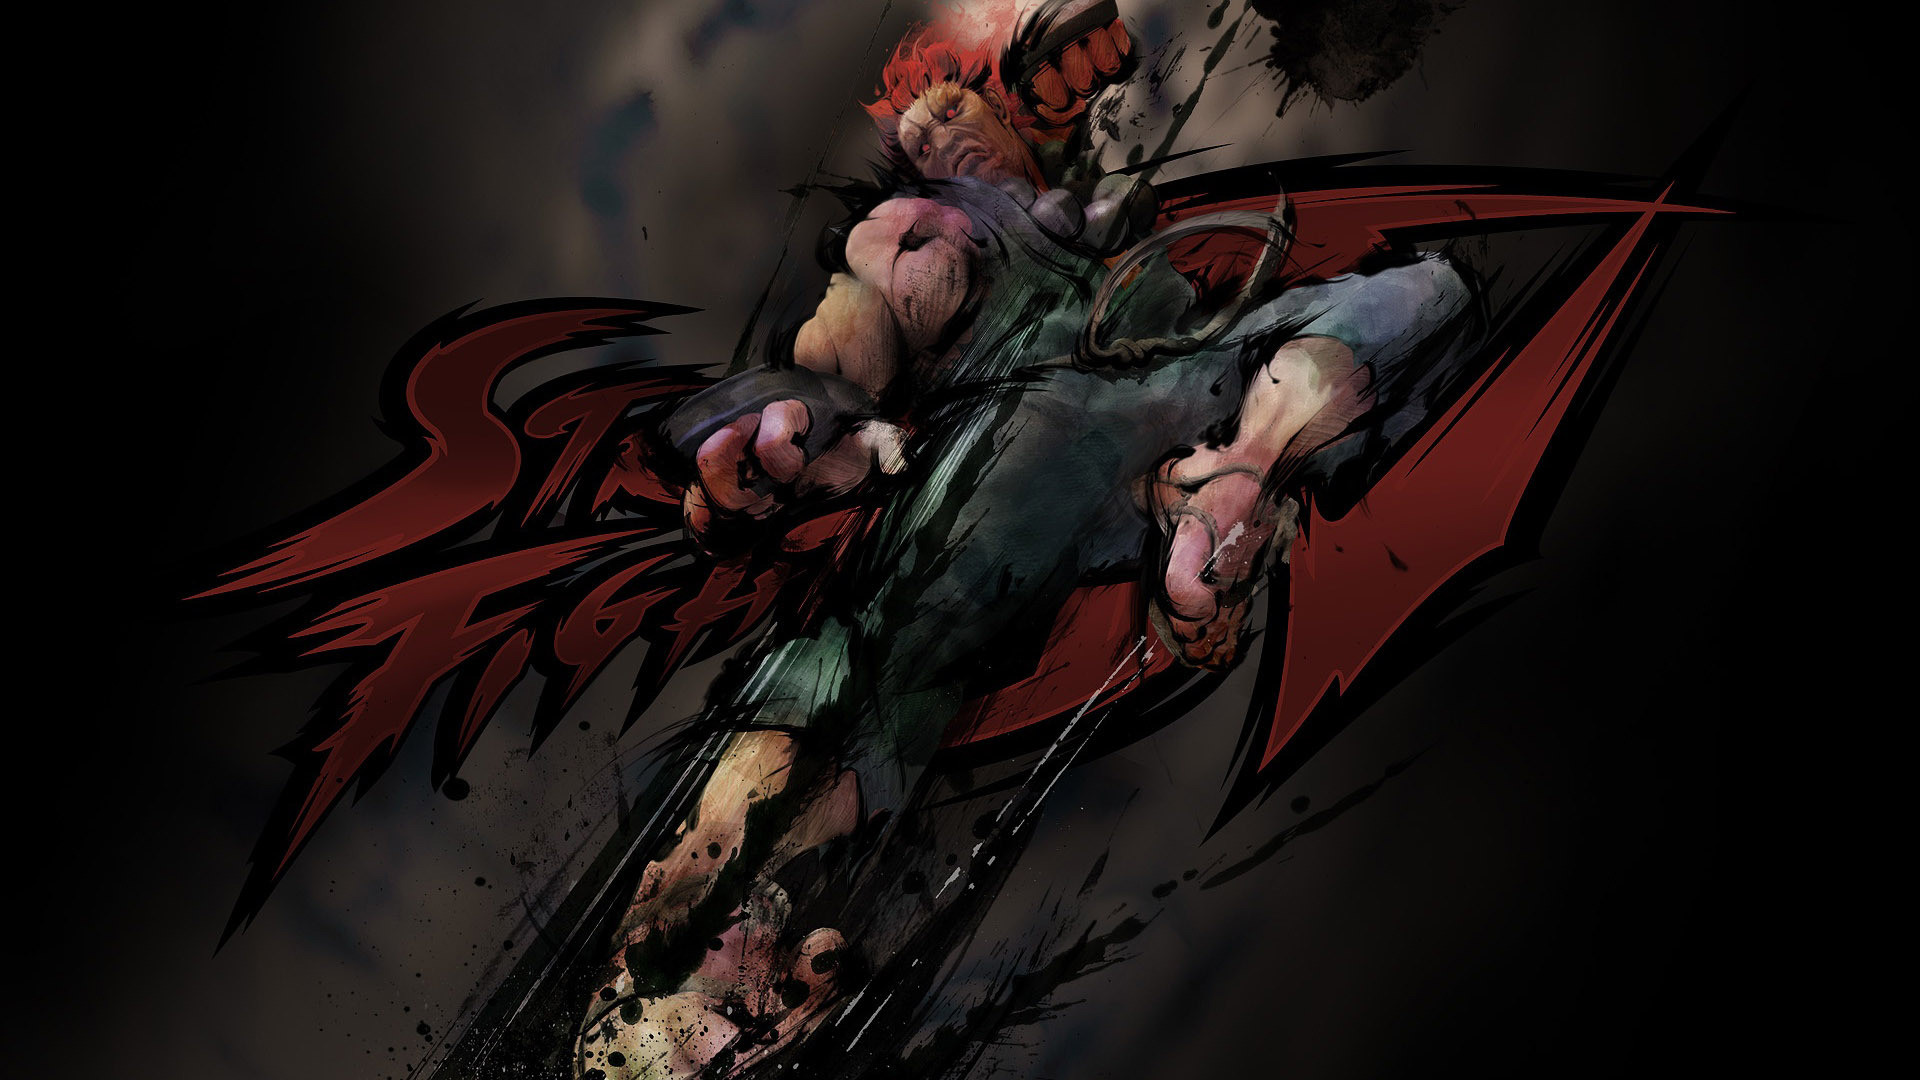 Res: 1920x1080, Evil Ryu - Street Fighter HD Wallpaper